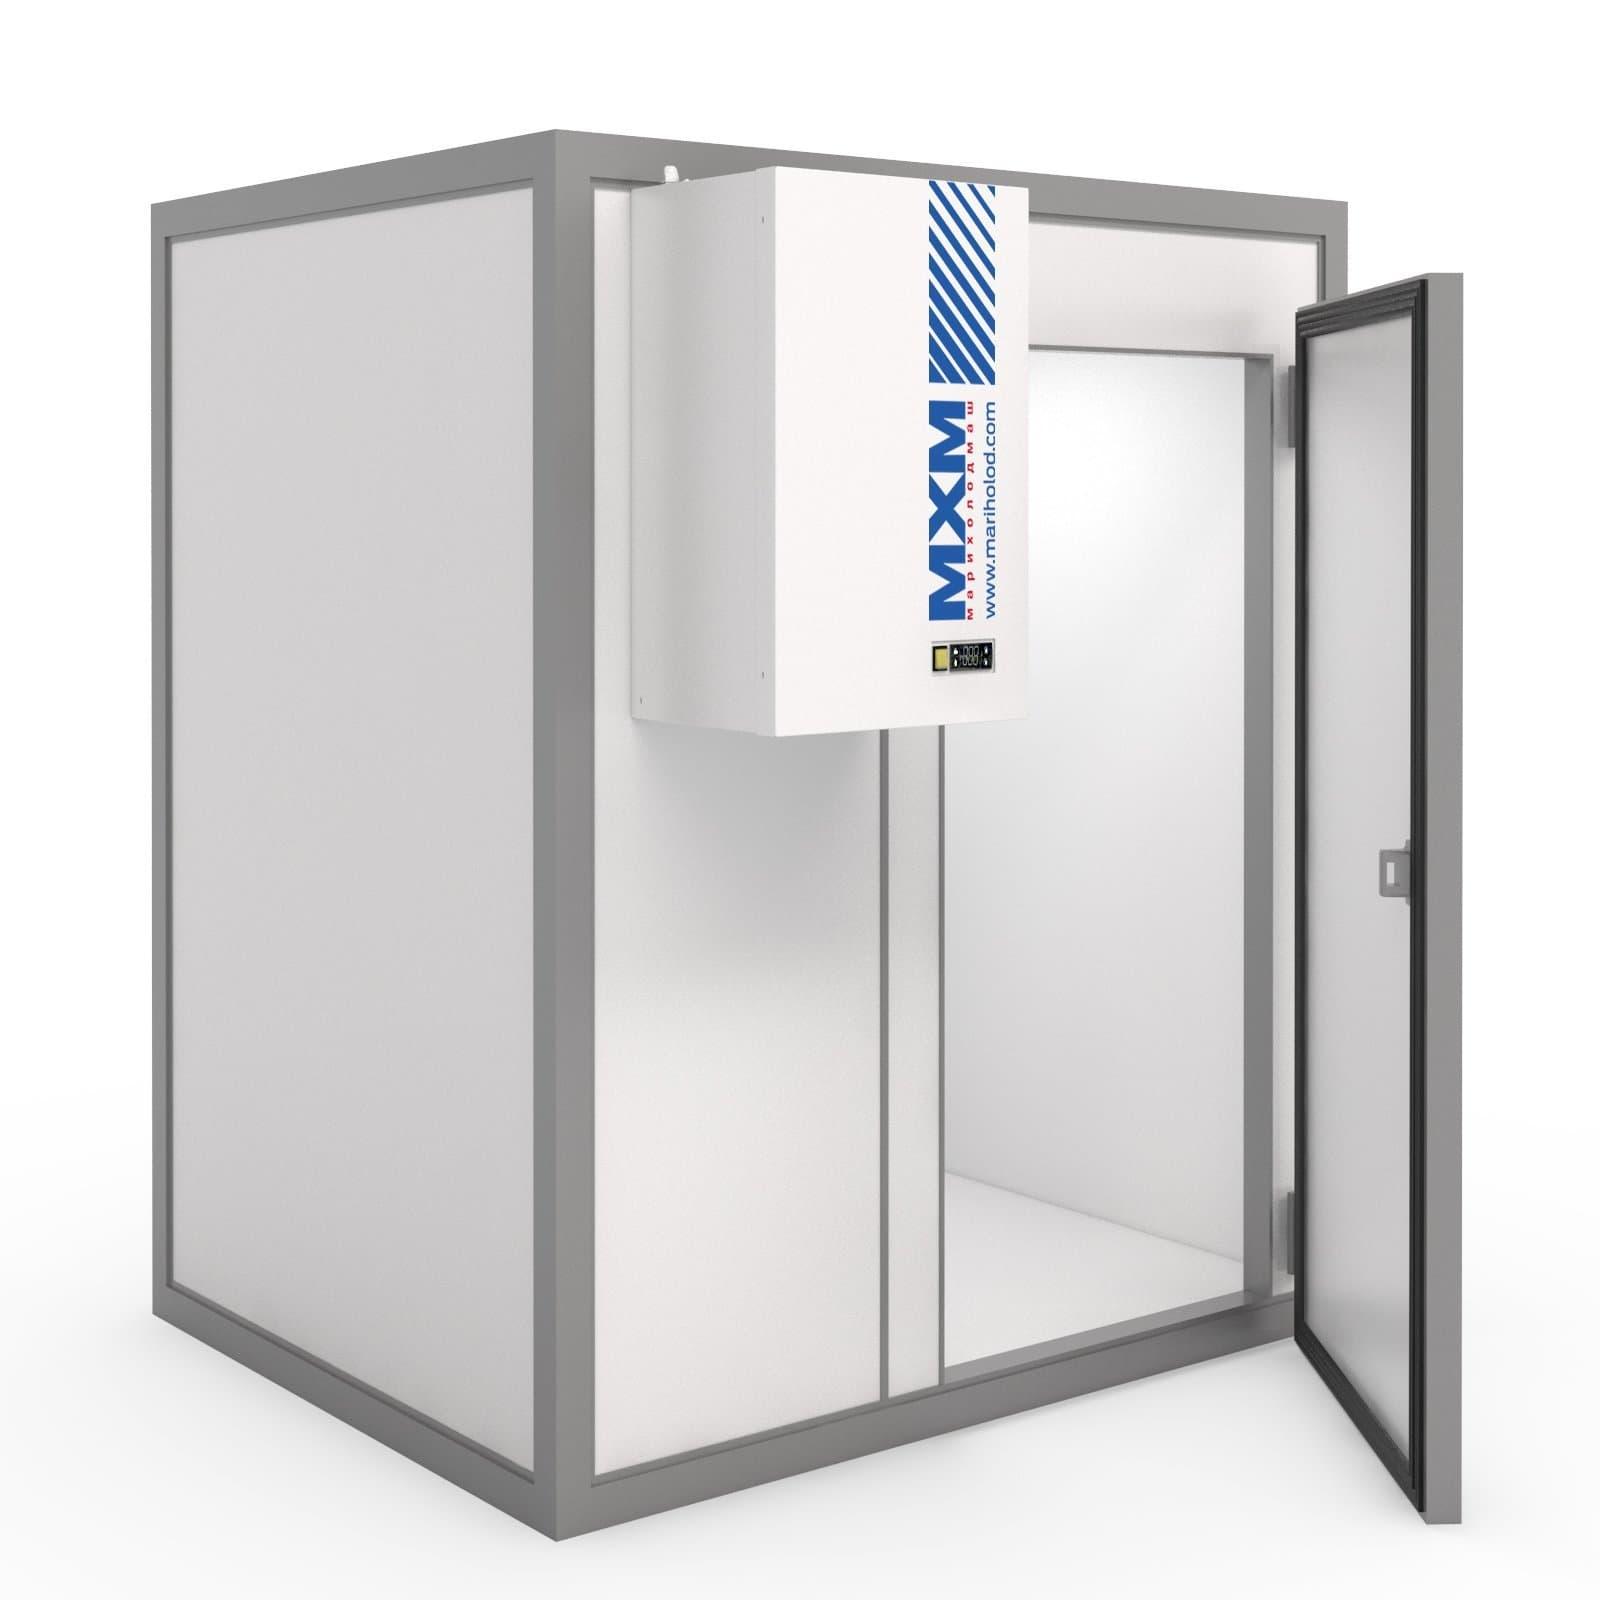 Камера холодильная МХМ КХН-24,79 1660×8260×2200